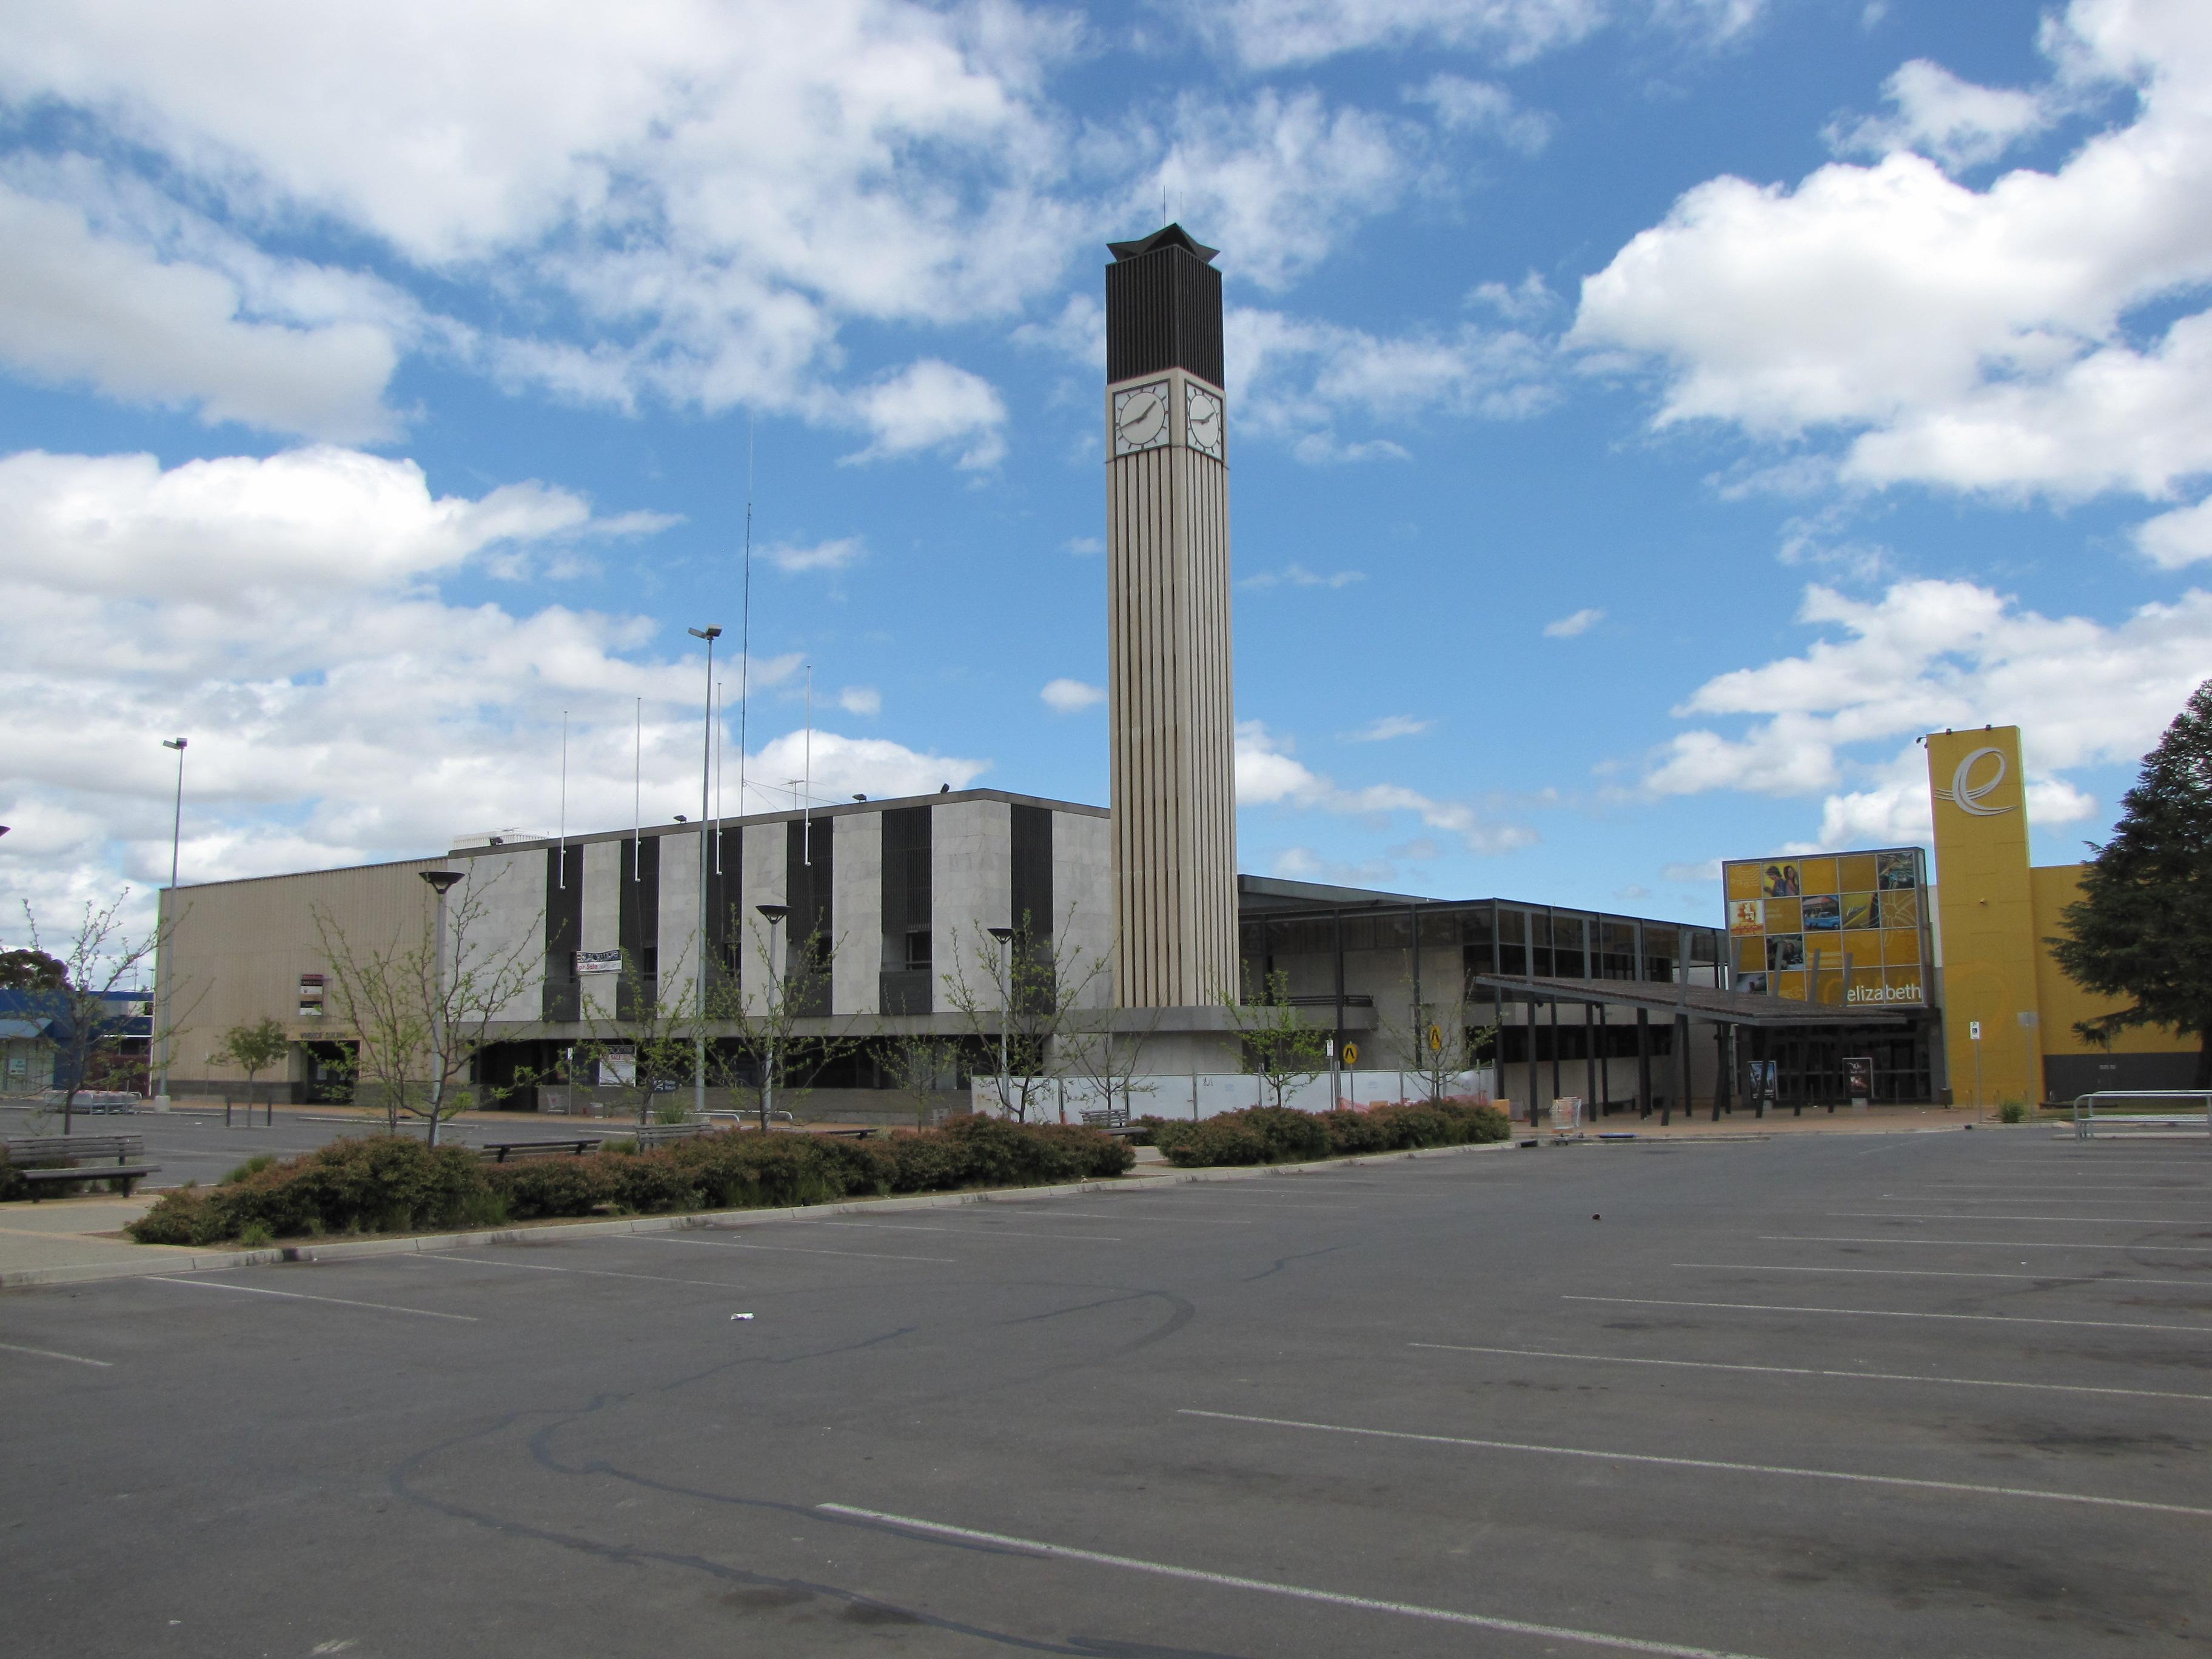 File:Clock Tower Elizabeth City Centre.JPG - Wikimedia Commonselizabeth city city